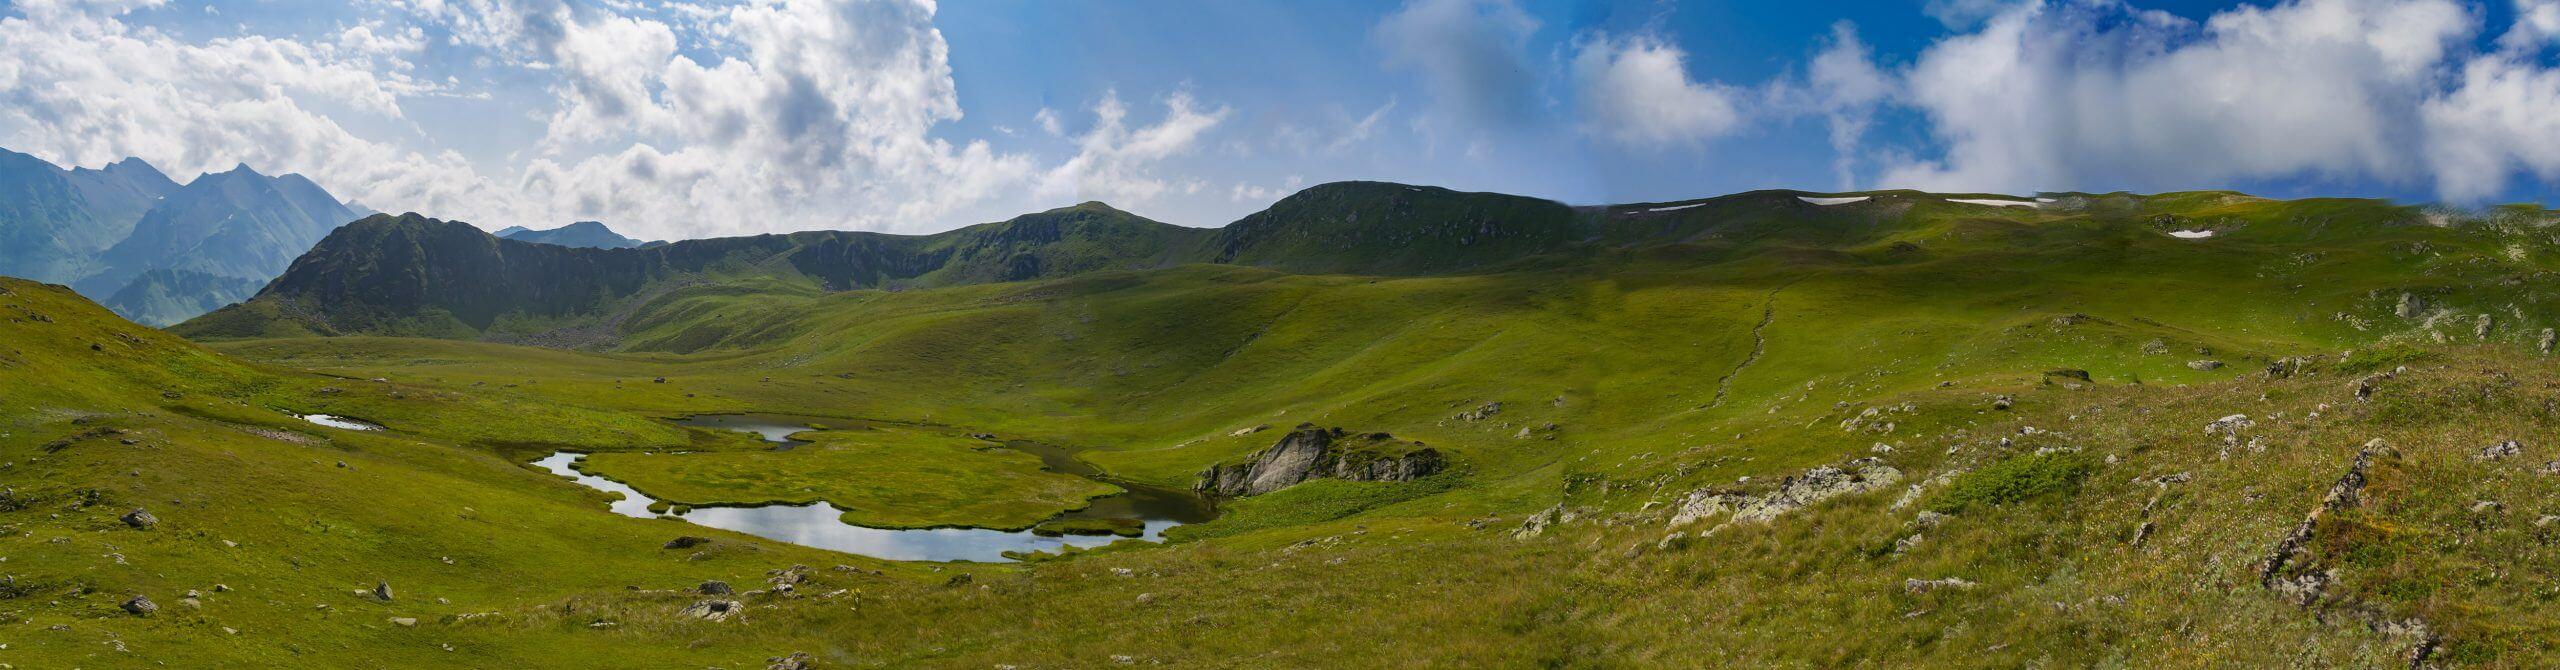 Панорама на Загеданский хребет